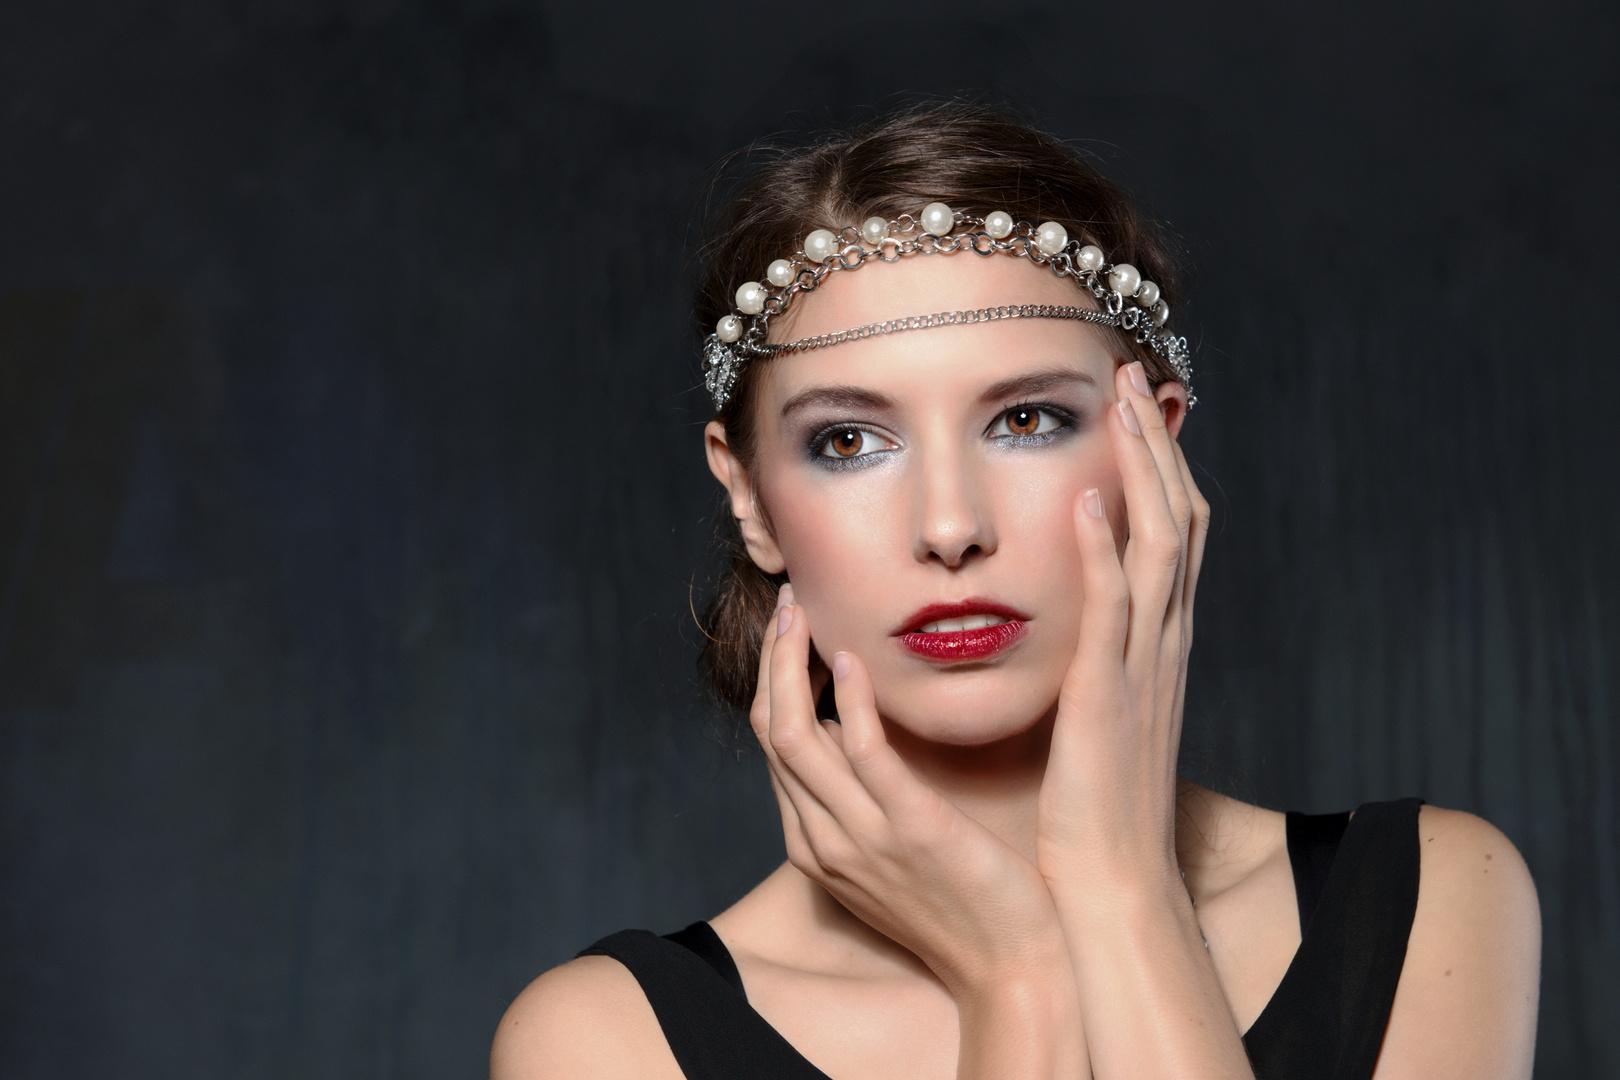 Model Elisa